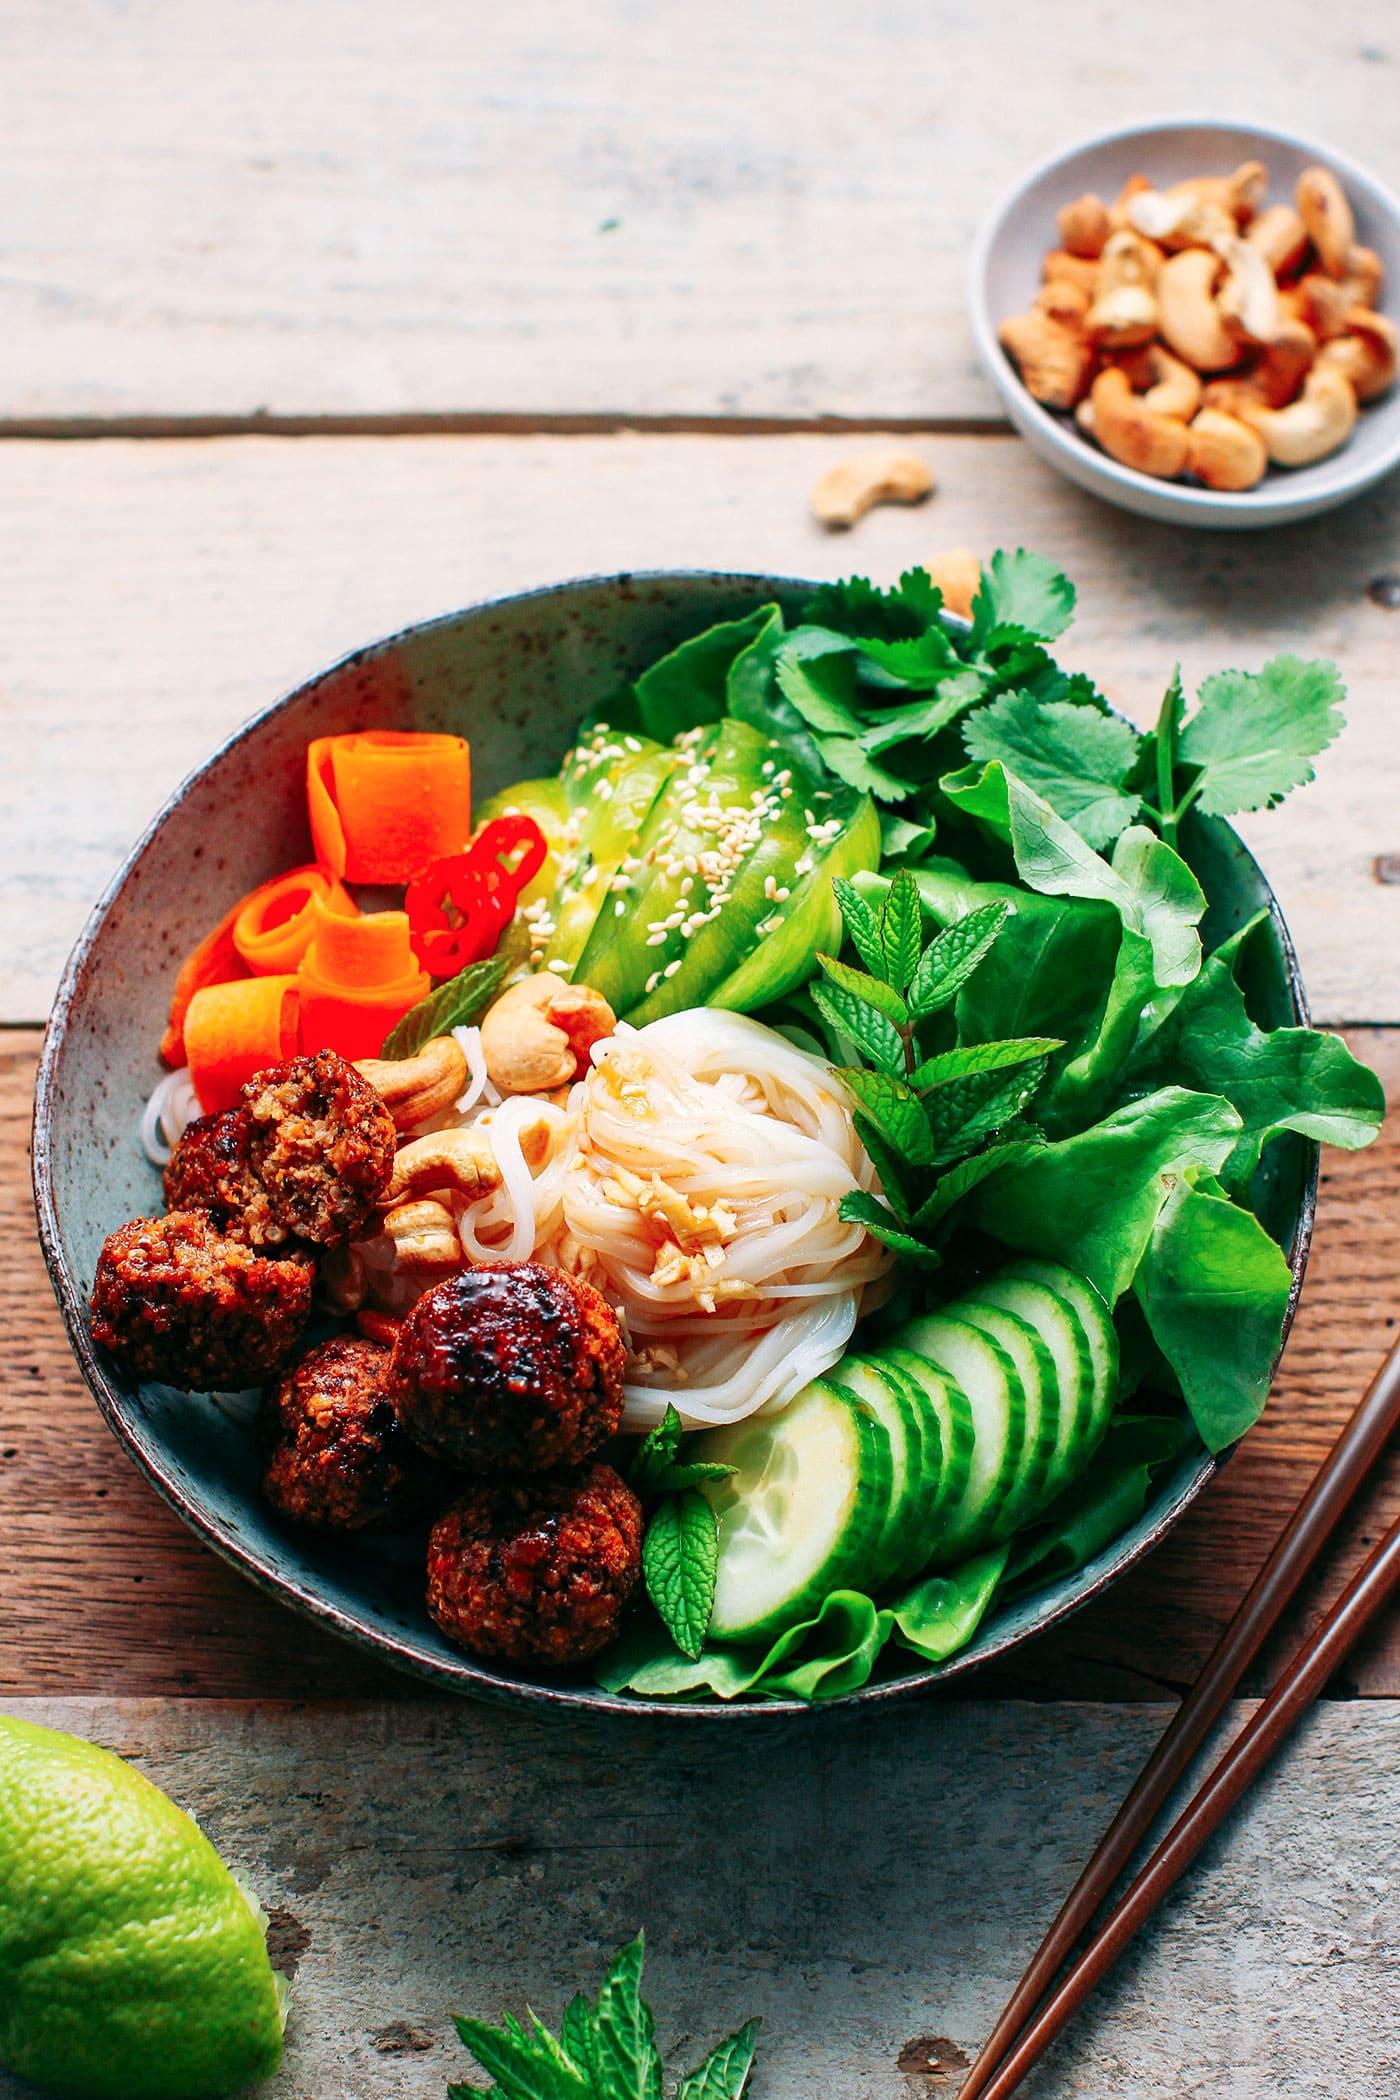 Vegan Meatball & Rice Noodle Salad